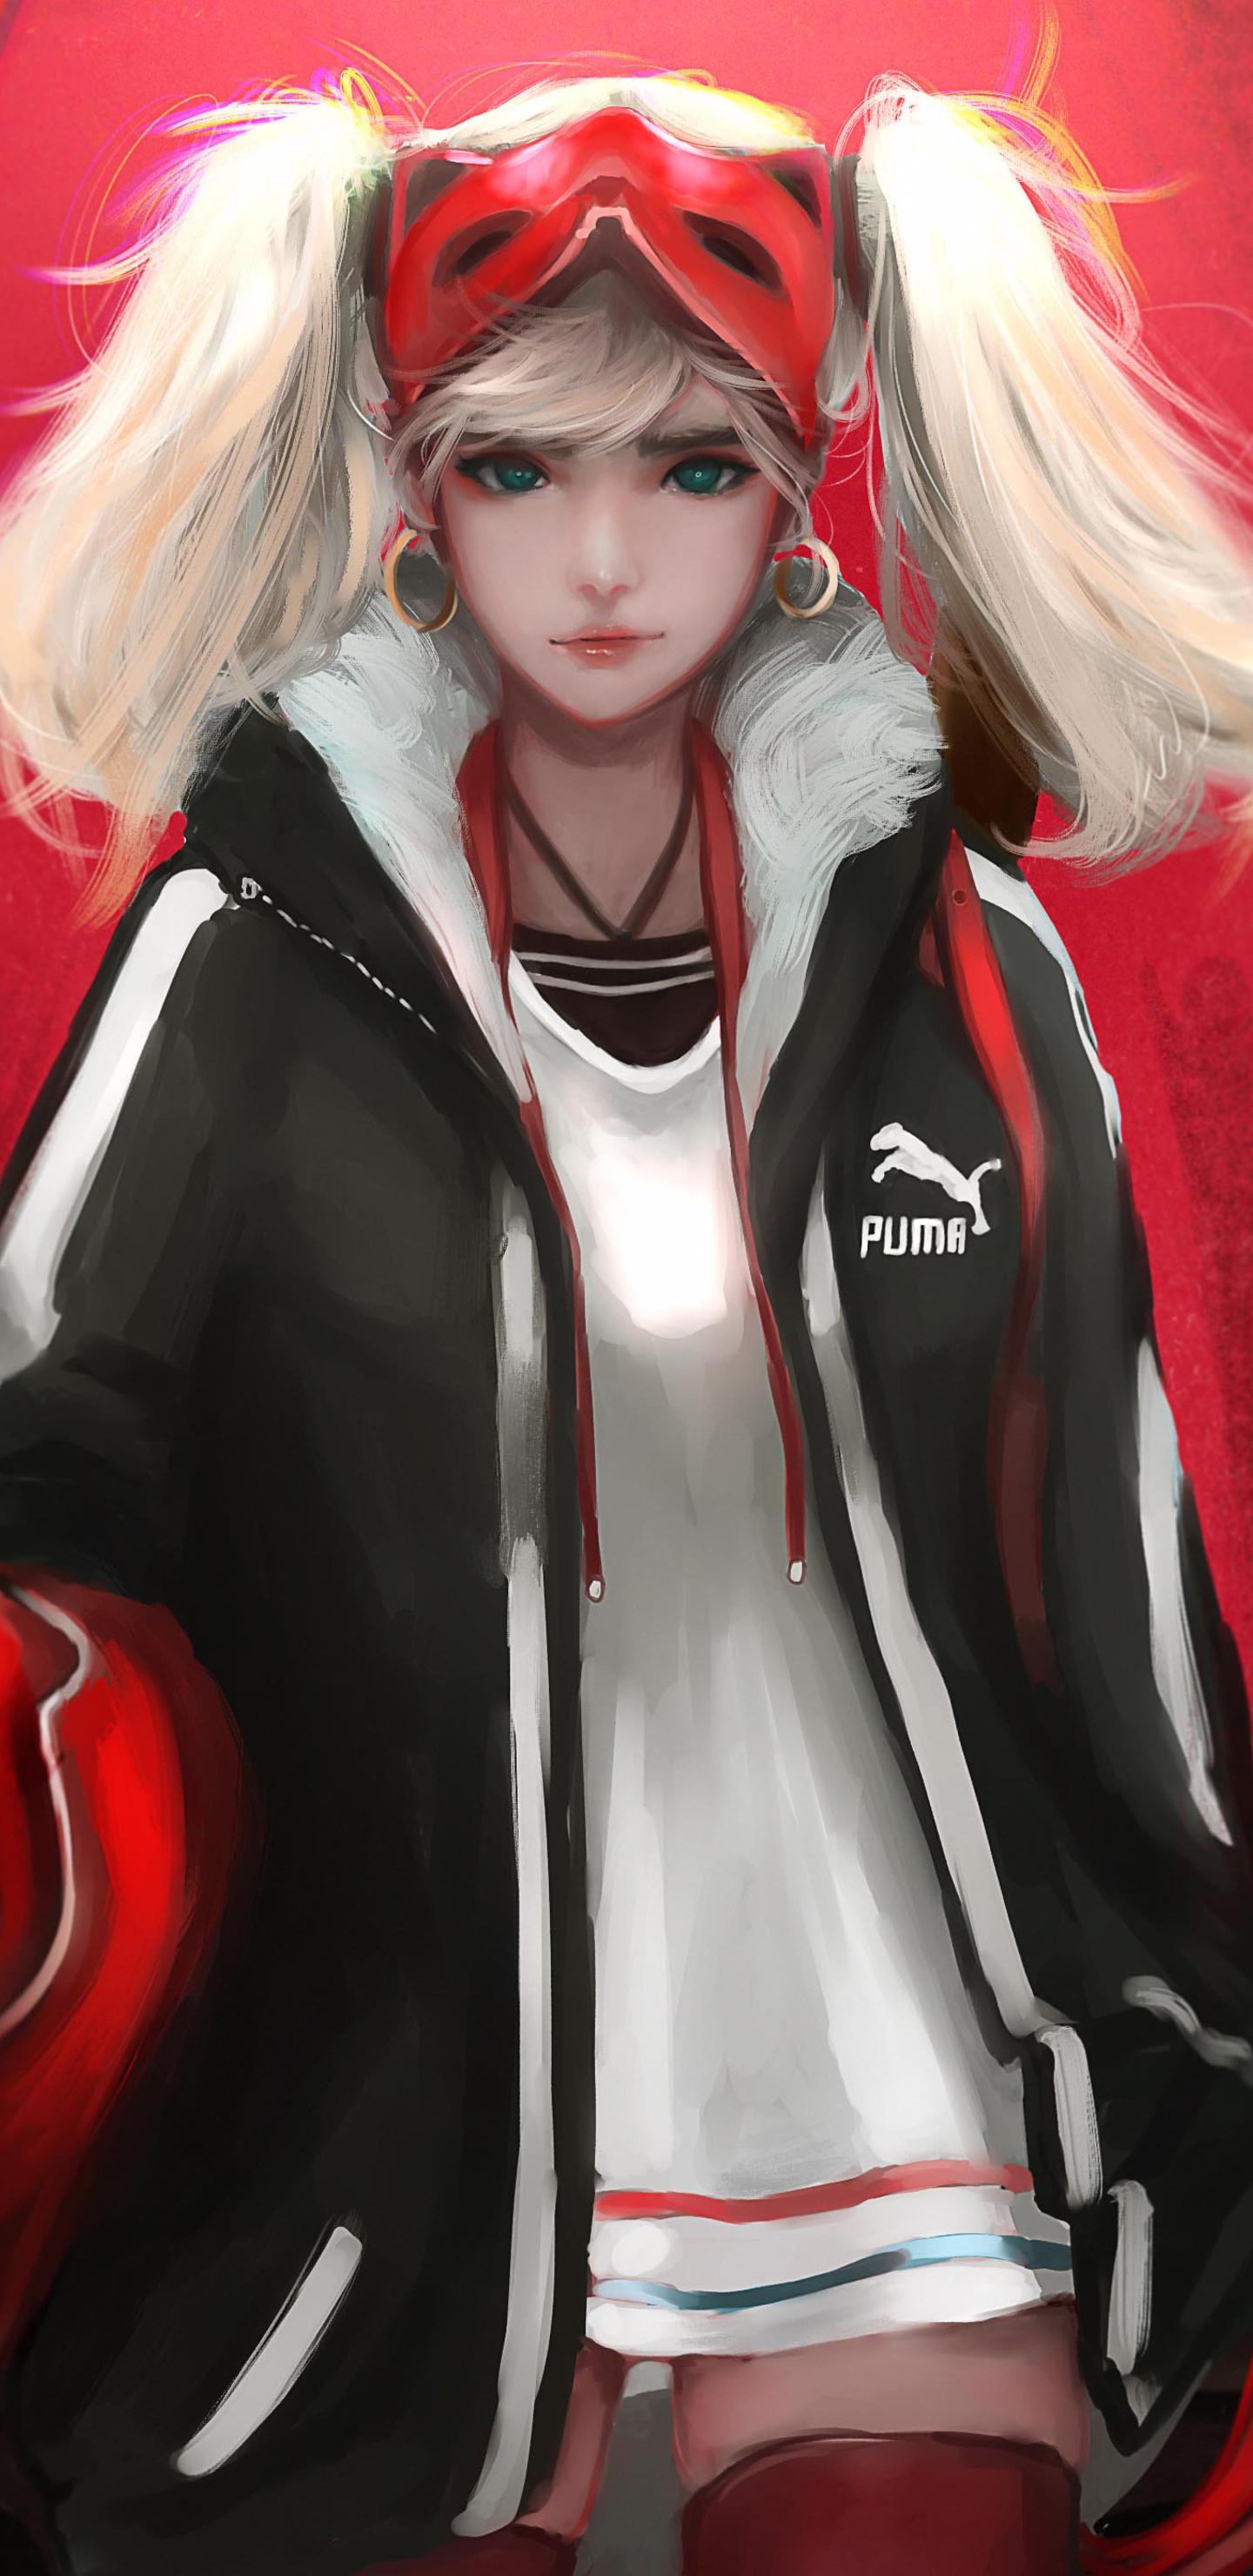 ann-takamaki-biker-girl-anime-5k-yf.jpg